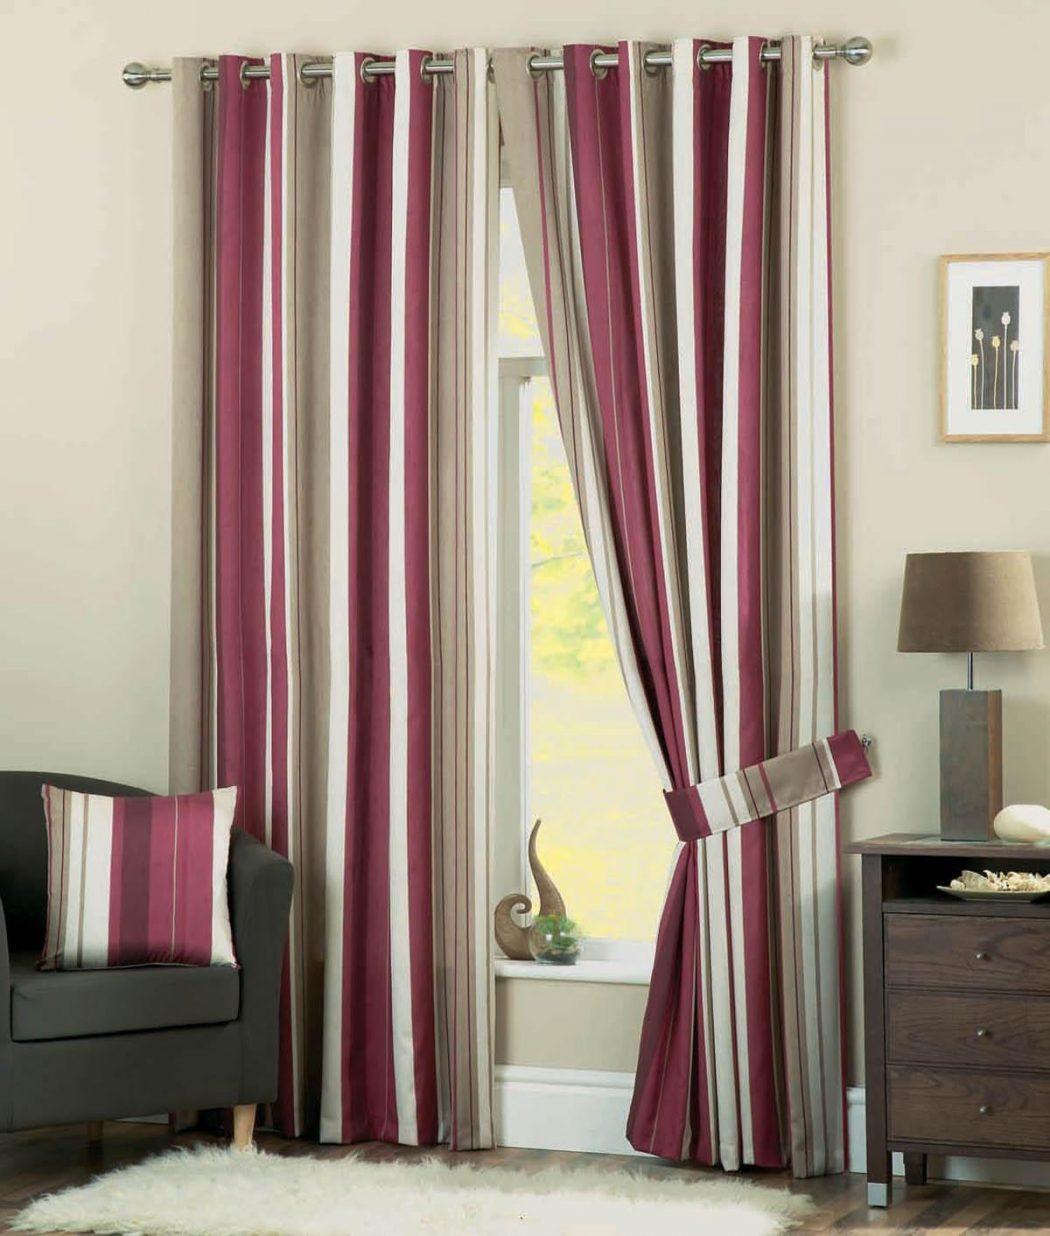 Whitworth-Claret 20+ Hottest Curtain Design Ideas for 2021